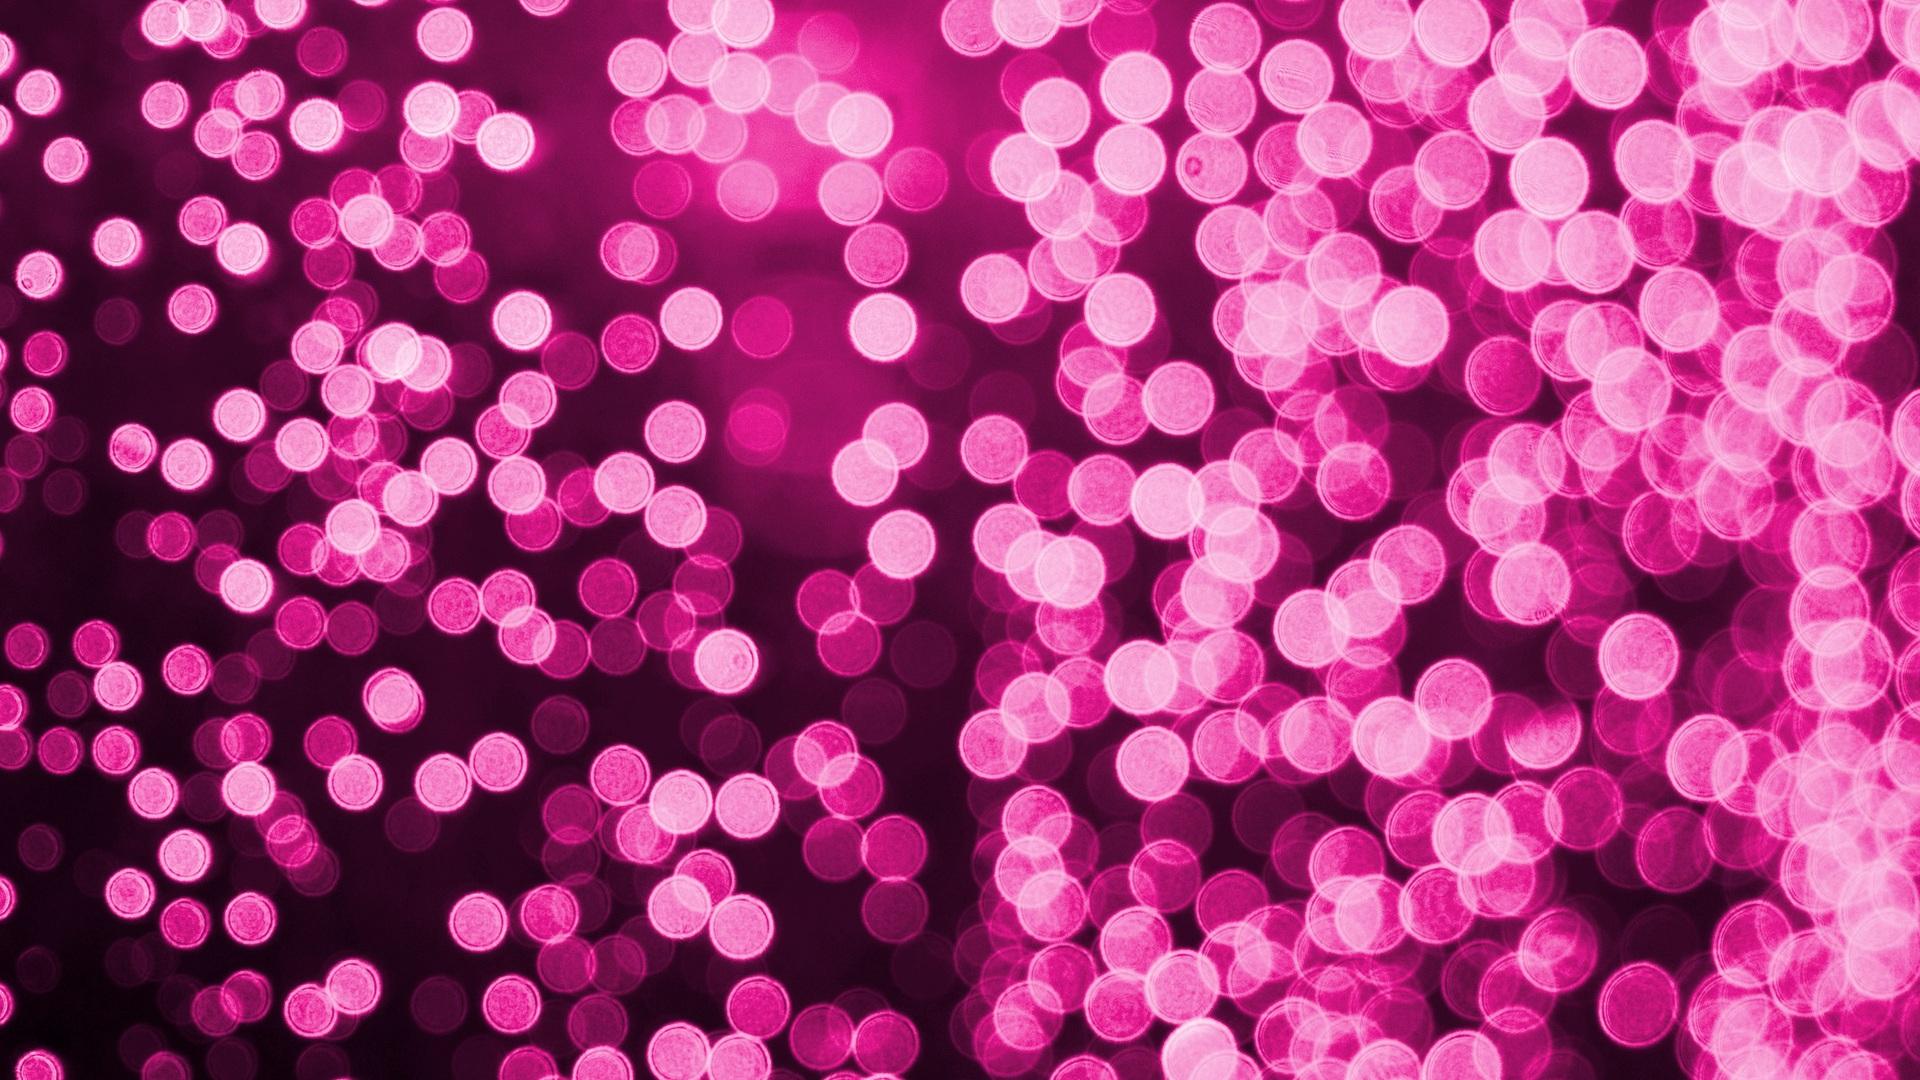 1920x1080 Bokeh Effect Pink Lights Celebrations Laptop Full Hd 1080p